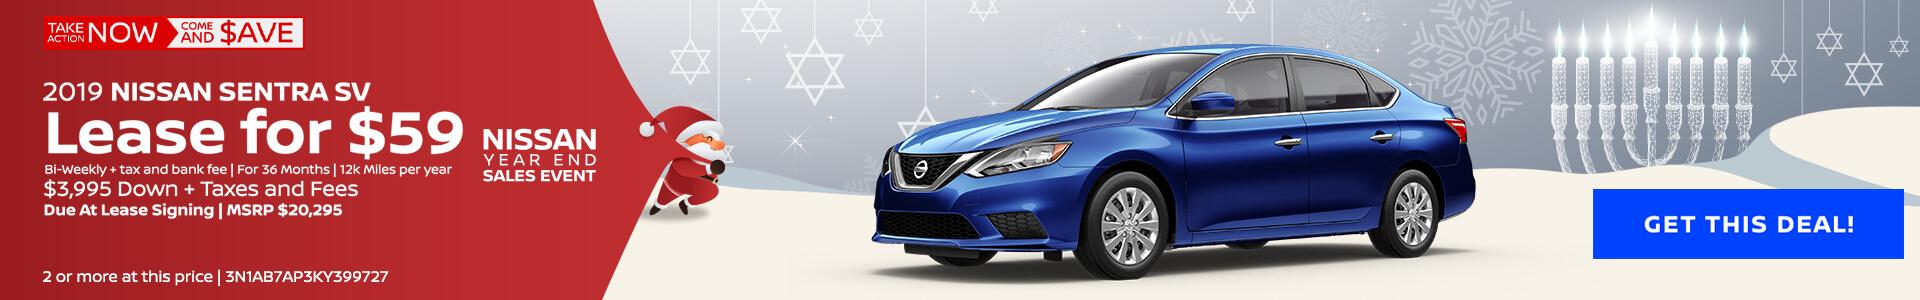 Nissan Sentra $59 Lease